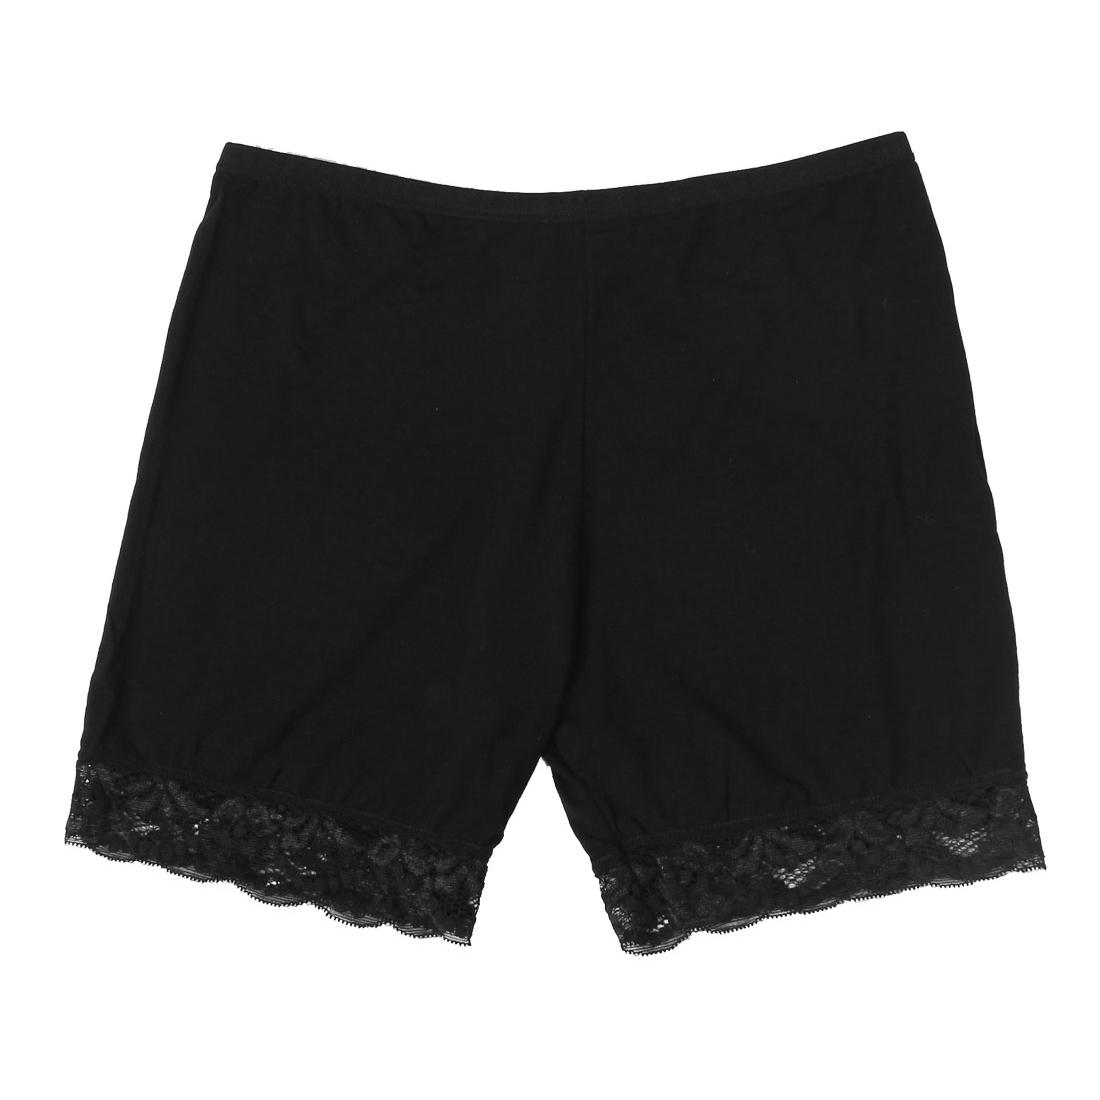 Women Lace Brim Elastic Waist Safety Panties Boyshort Boxers Black XS